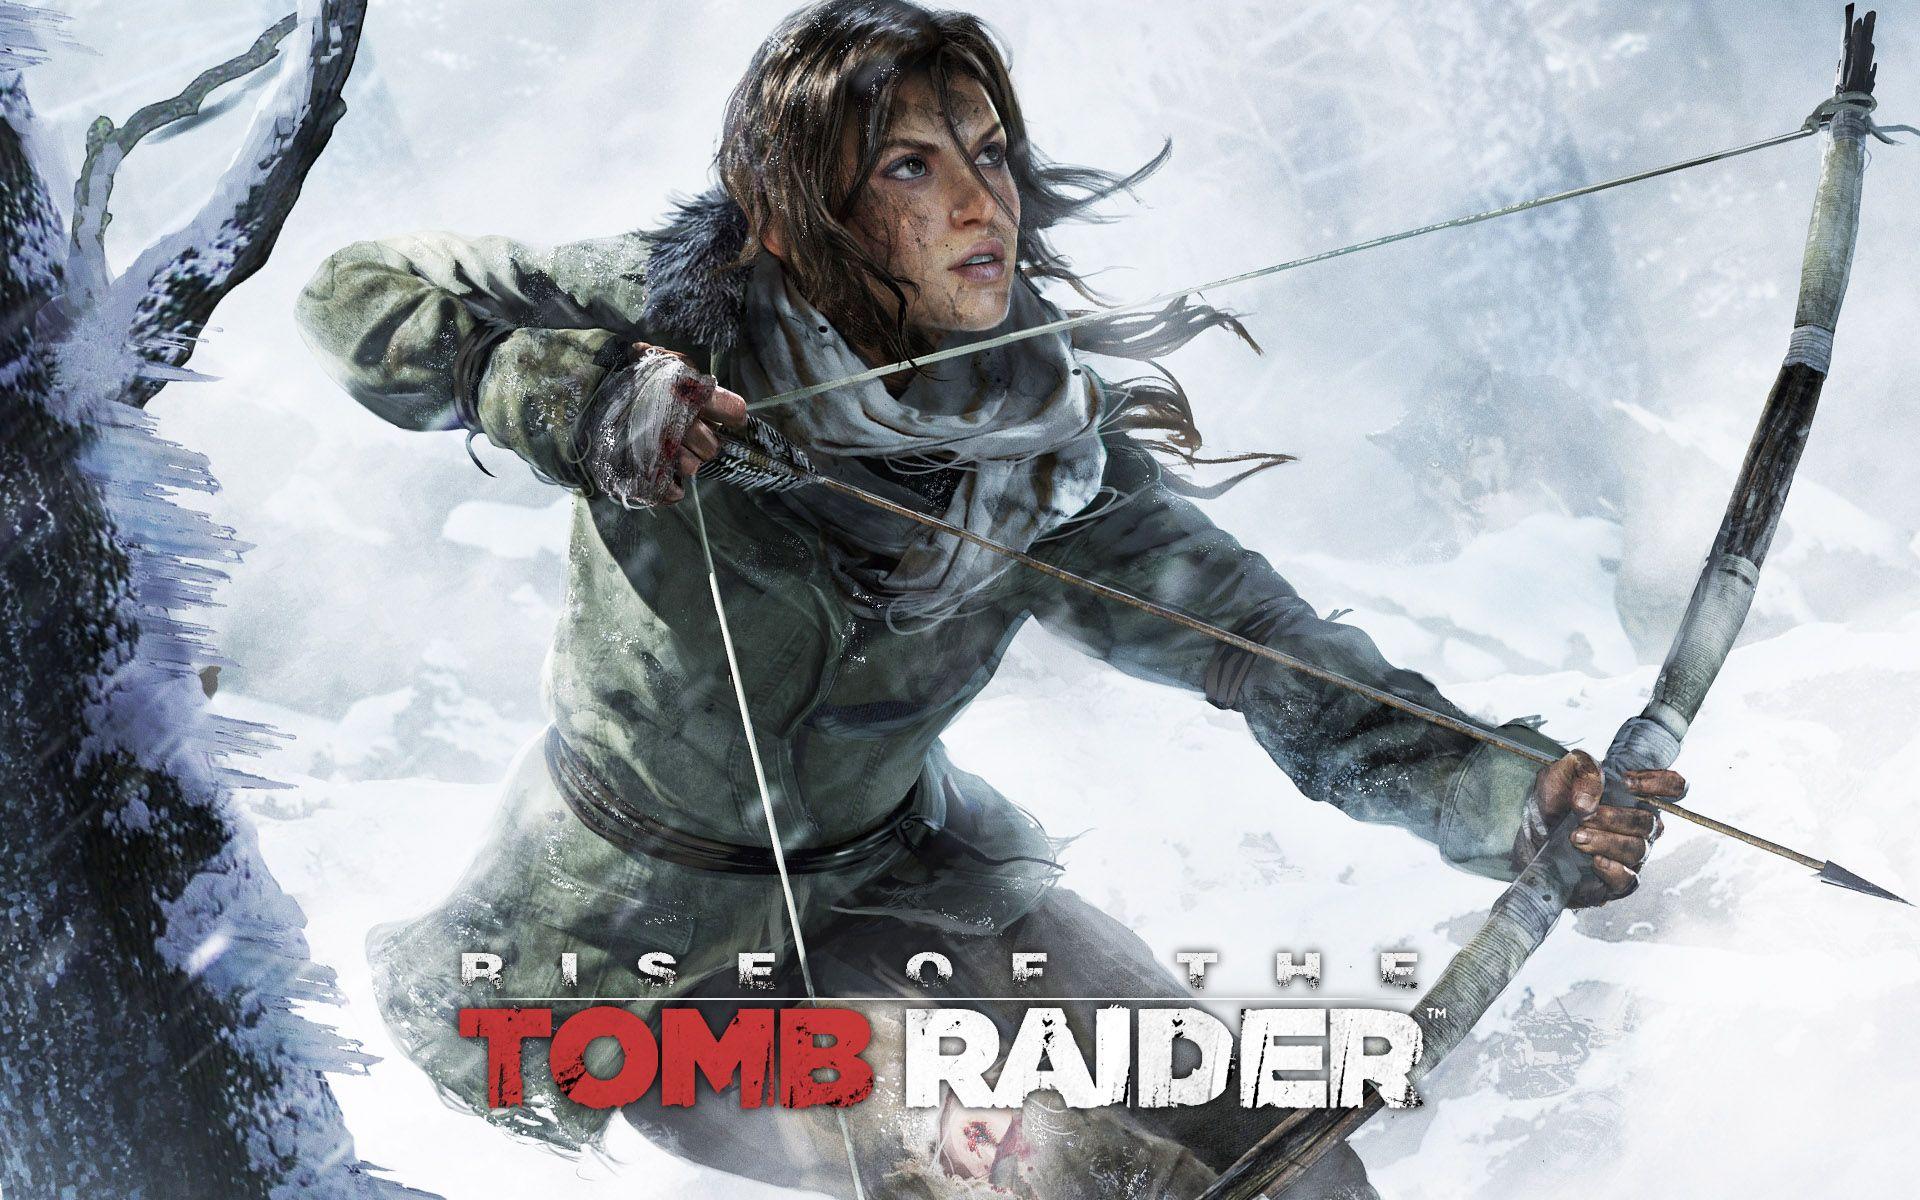 Rise Of The Tomb Raider Wallpaper Lara Croft Xbox 360 Xbox One Ps4